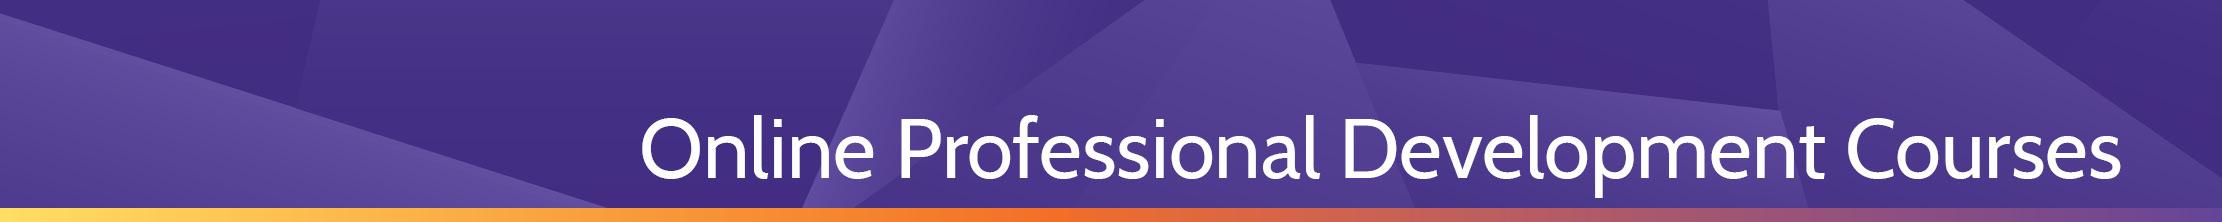 Online Professional Development Courses